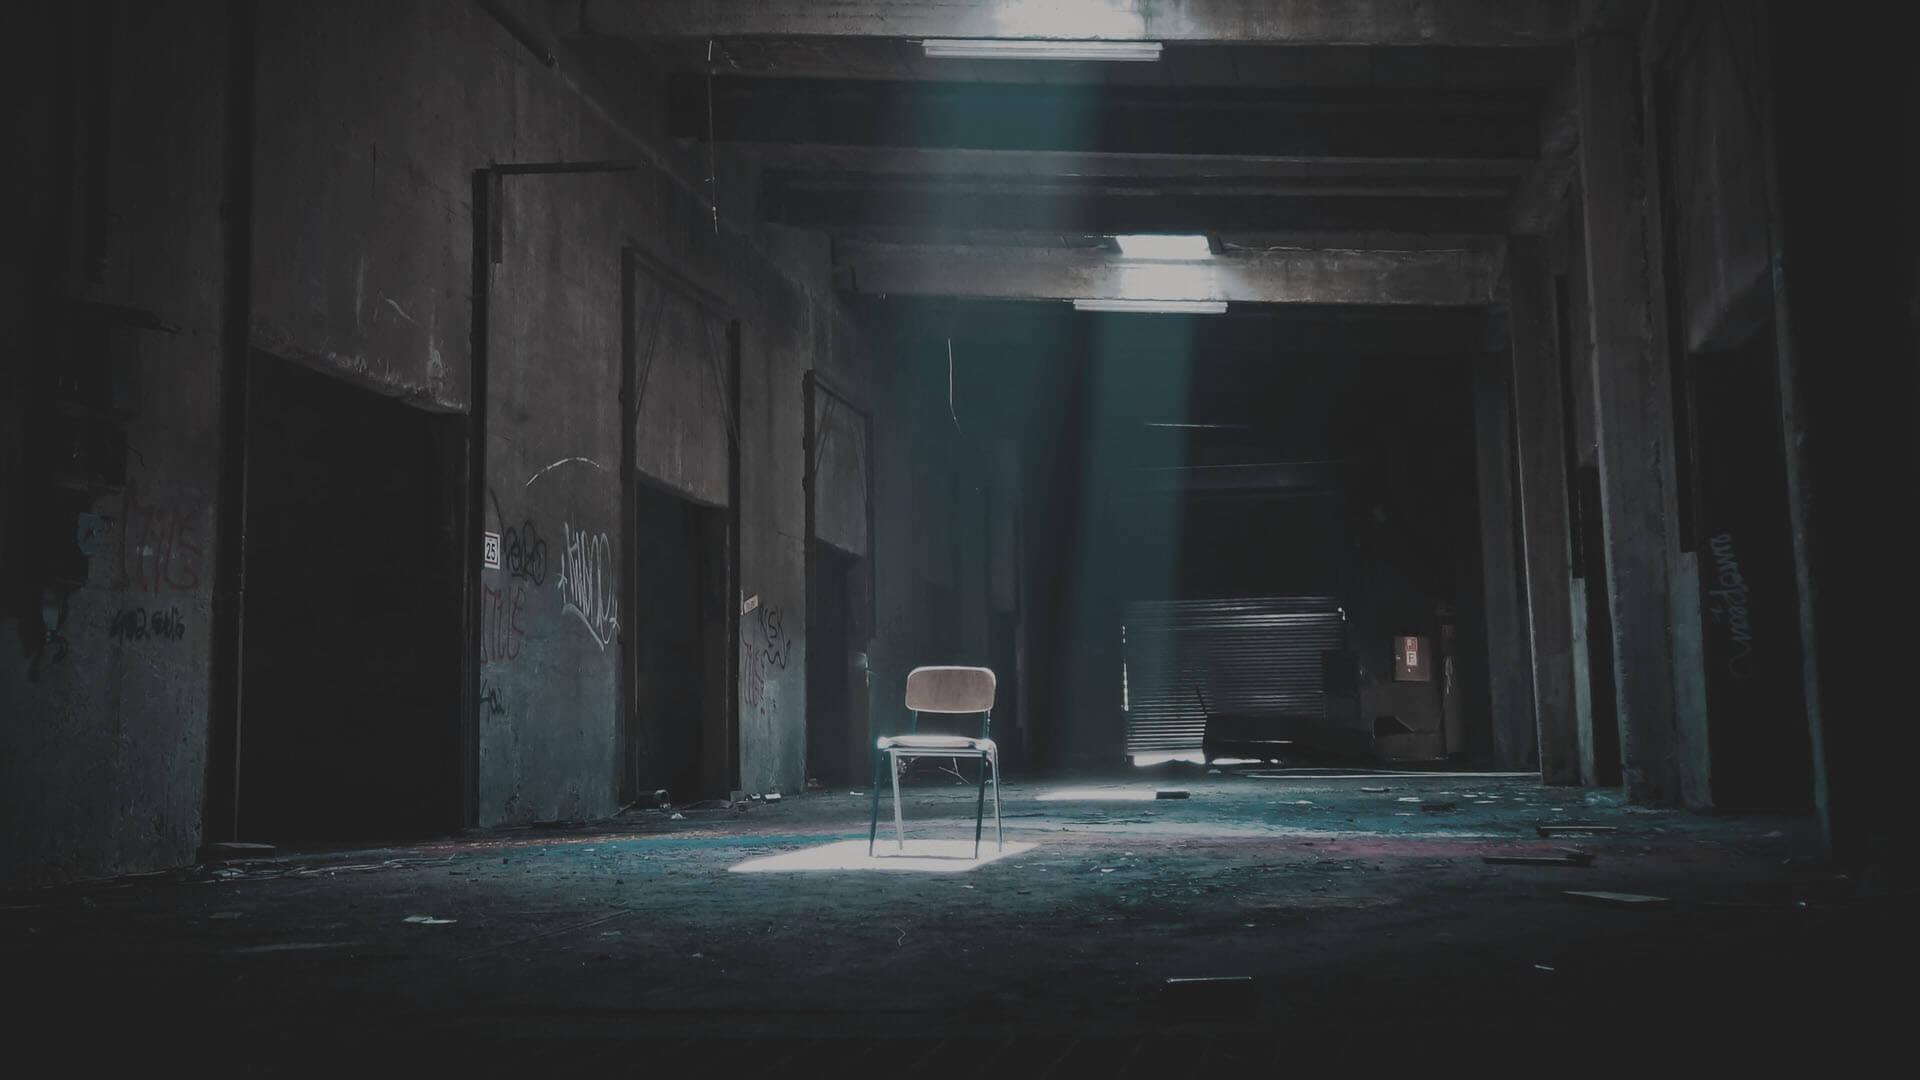 Opuszczony pokój escape room